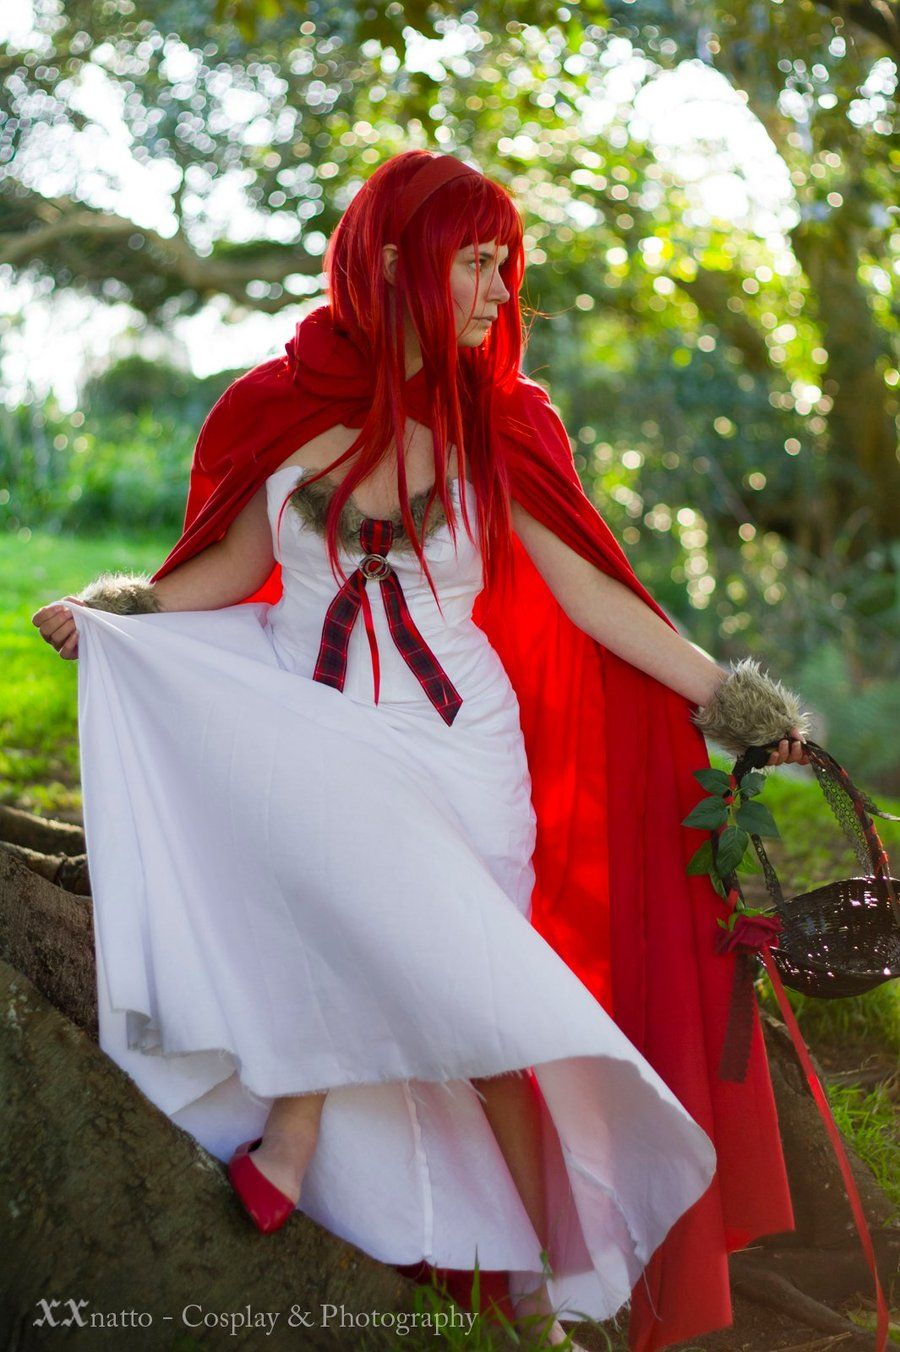 Worksheet Little Red Riding Hood 2 pinterest the worlds catalogue of ideas